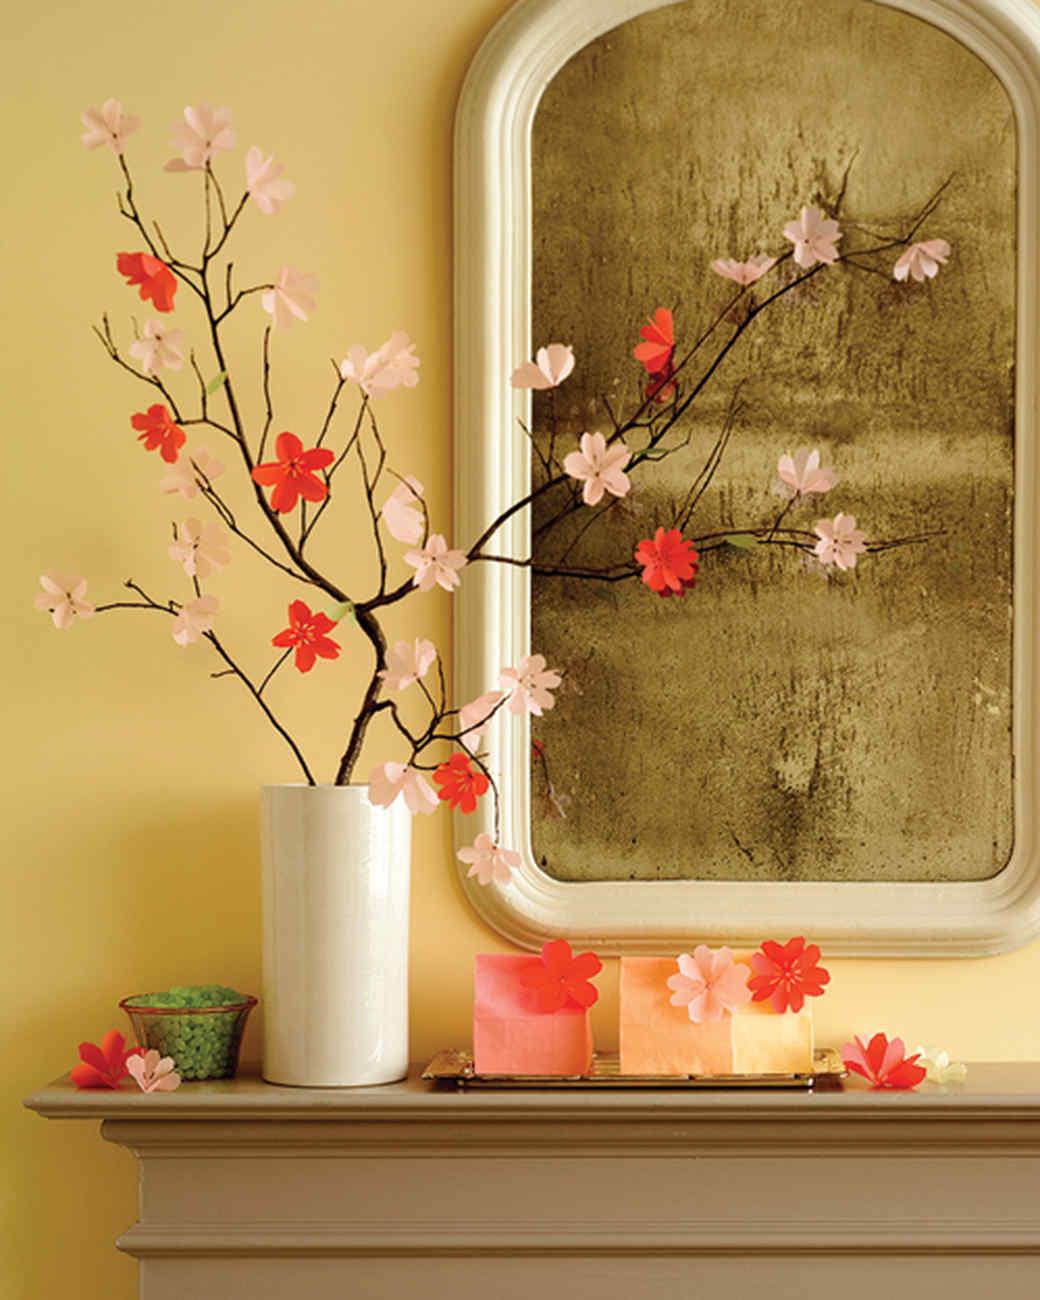 Marvelous Cherry Blossom Display